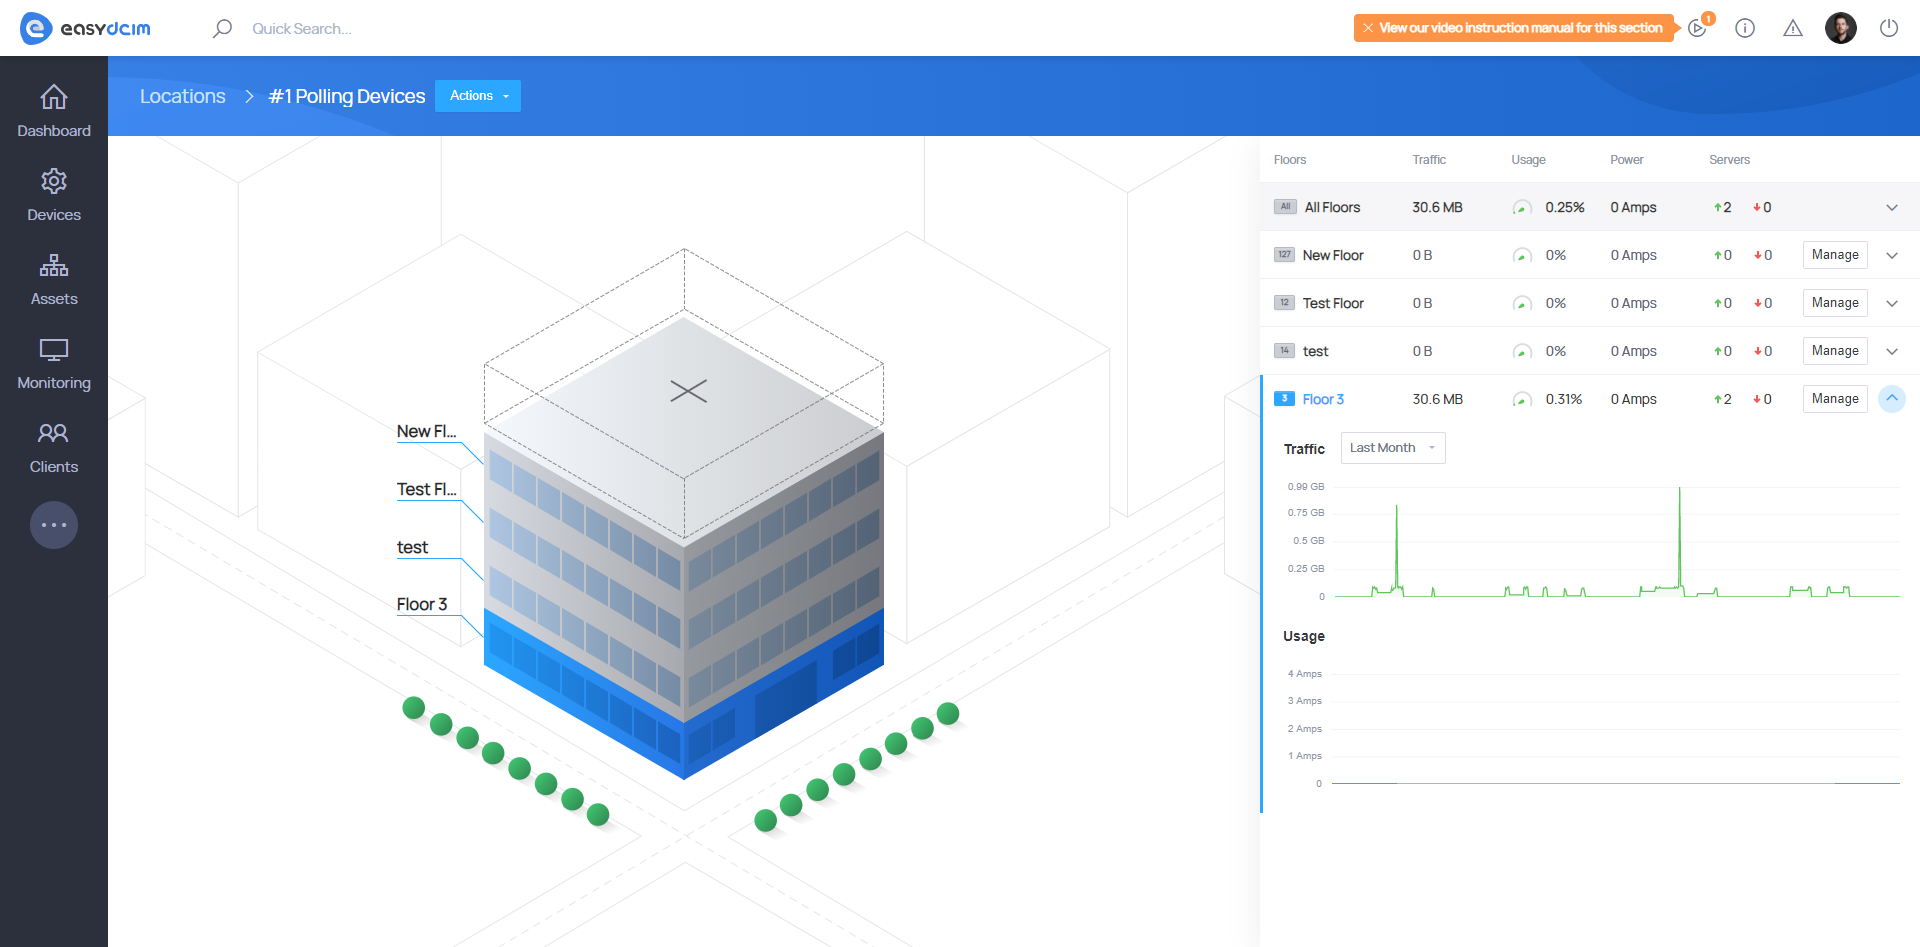 Floors & Racks - Building 2D View - EasyDCIM v1.8.0